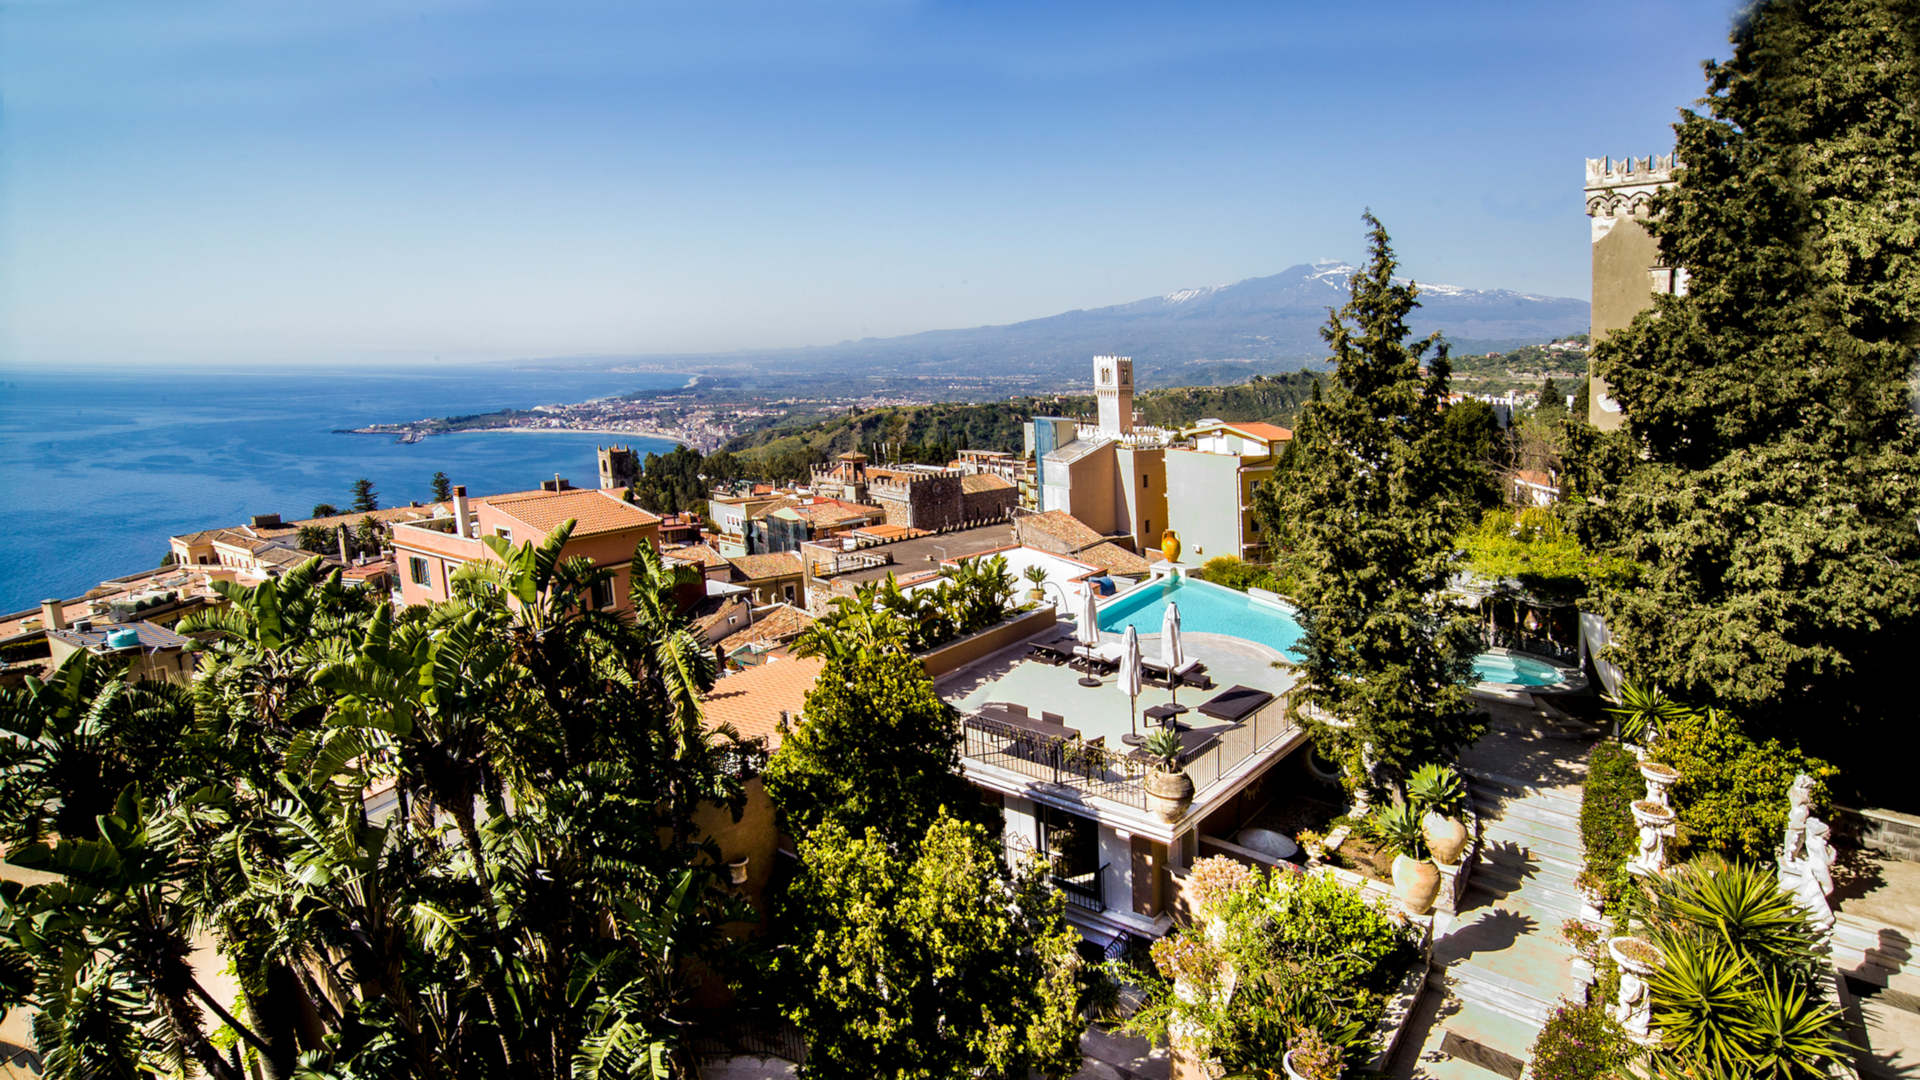 villas-with-pool-in-taormina